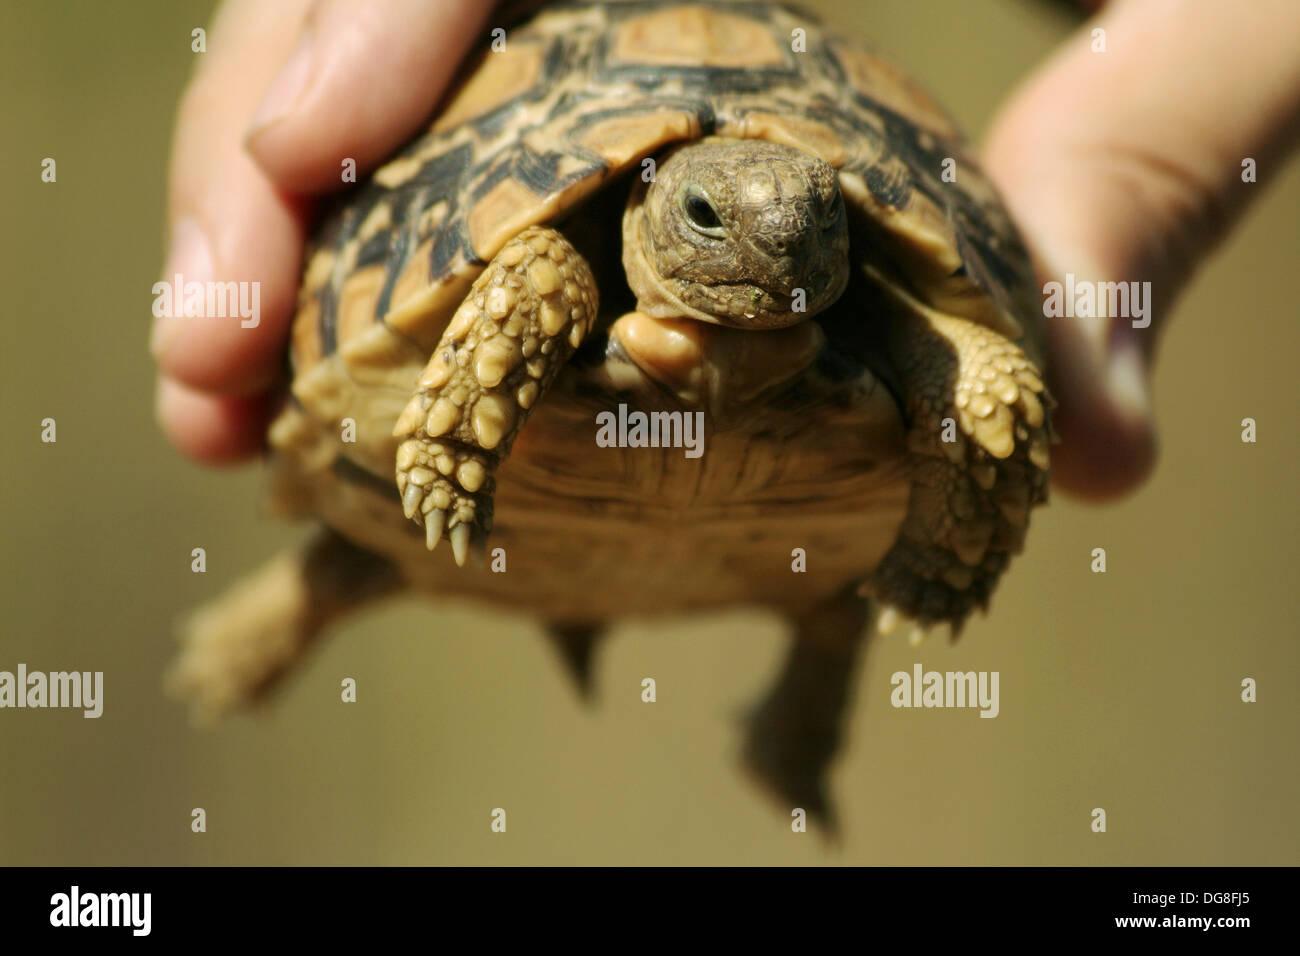 Leopard Tortoise in Zimbabwe - Stock Image